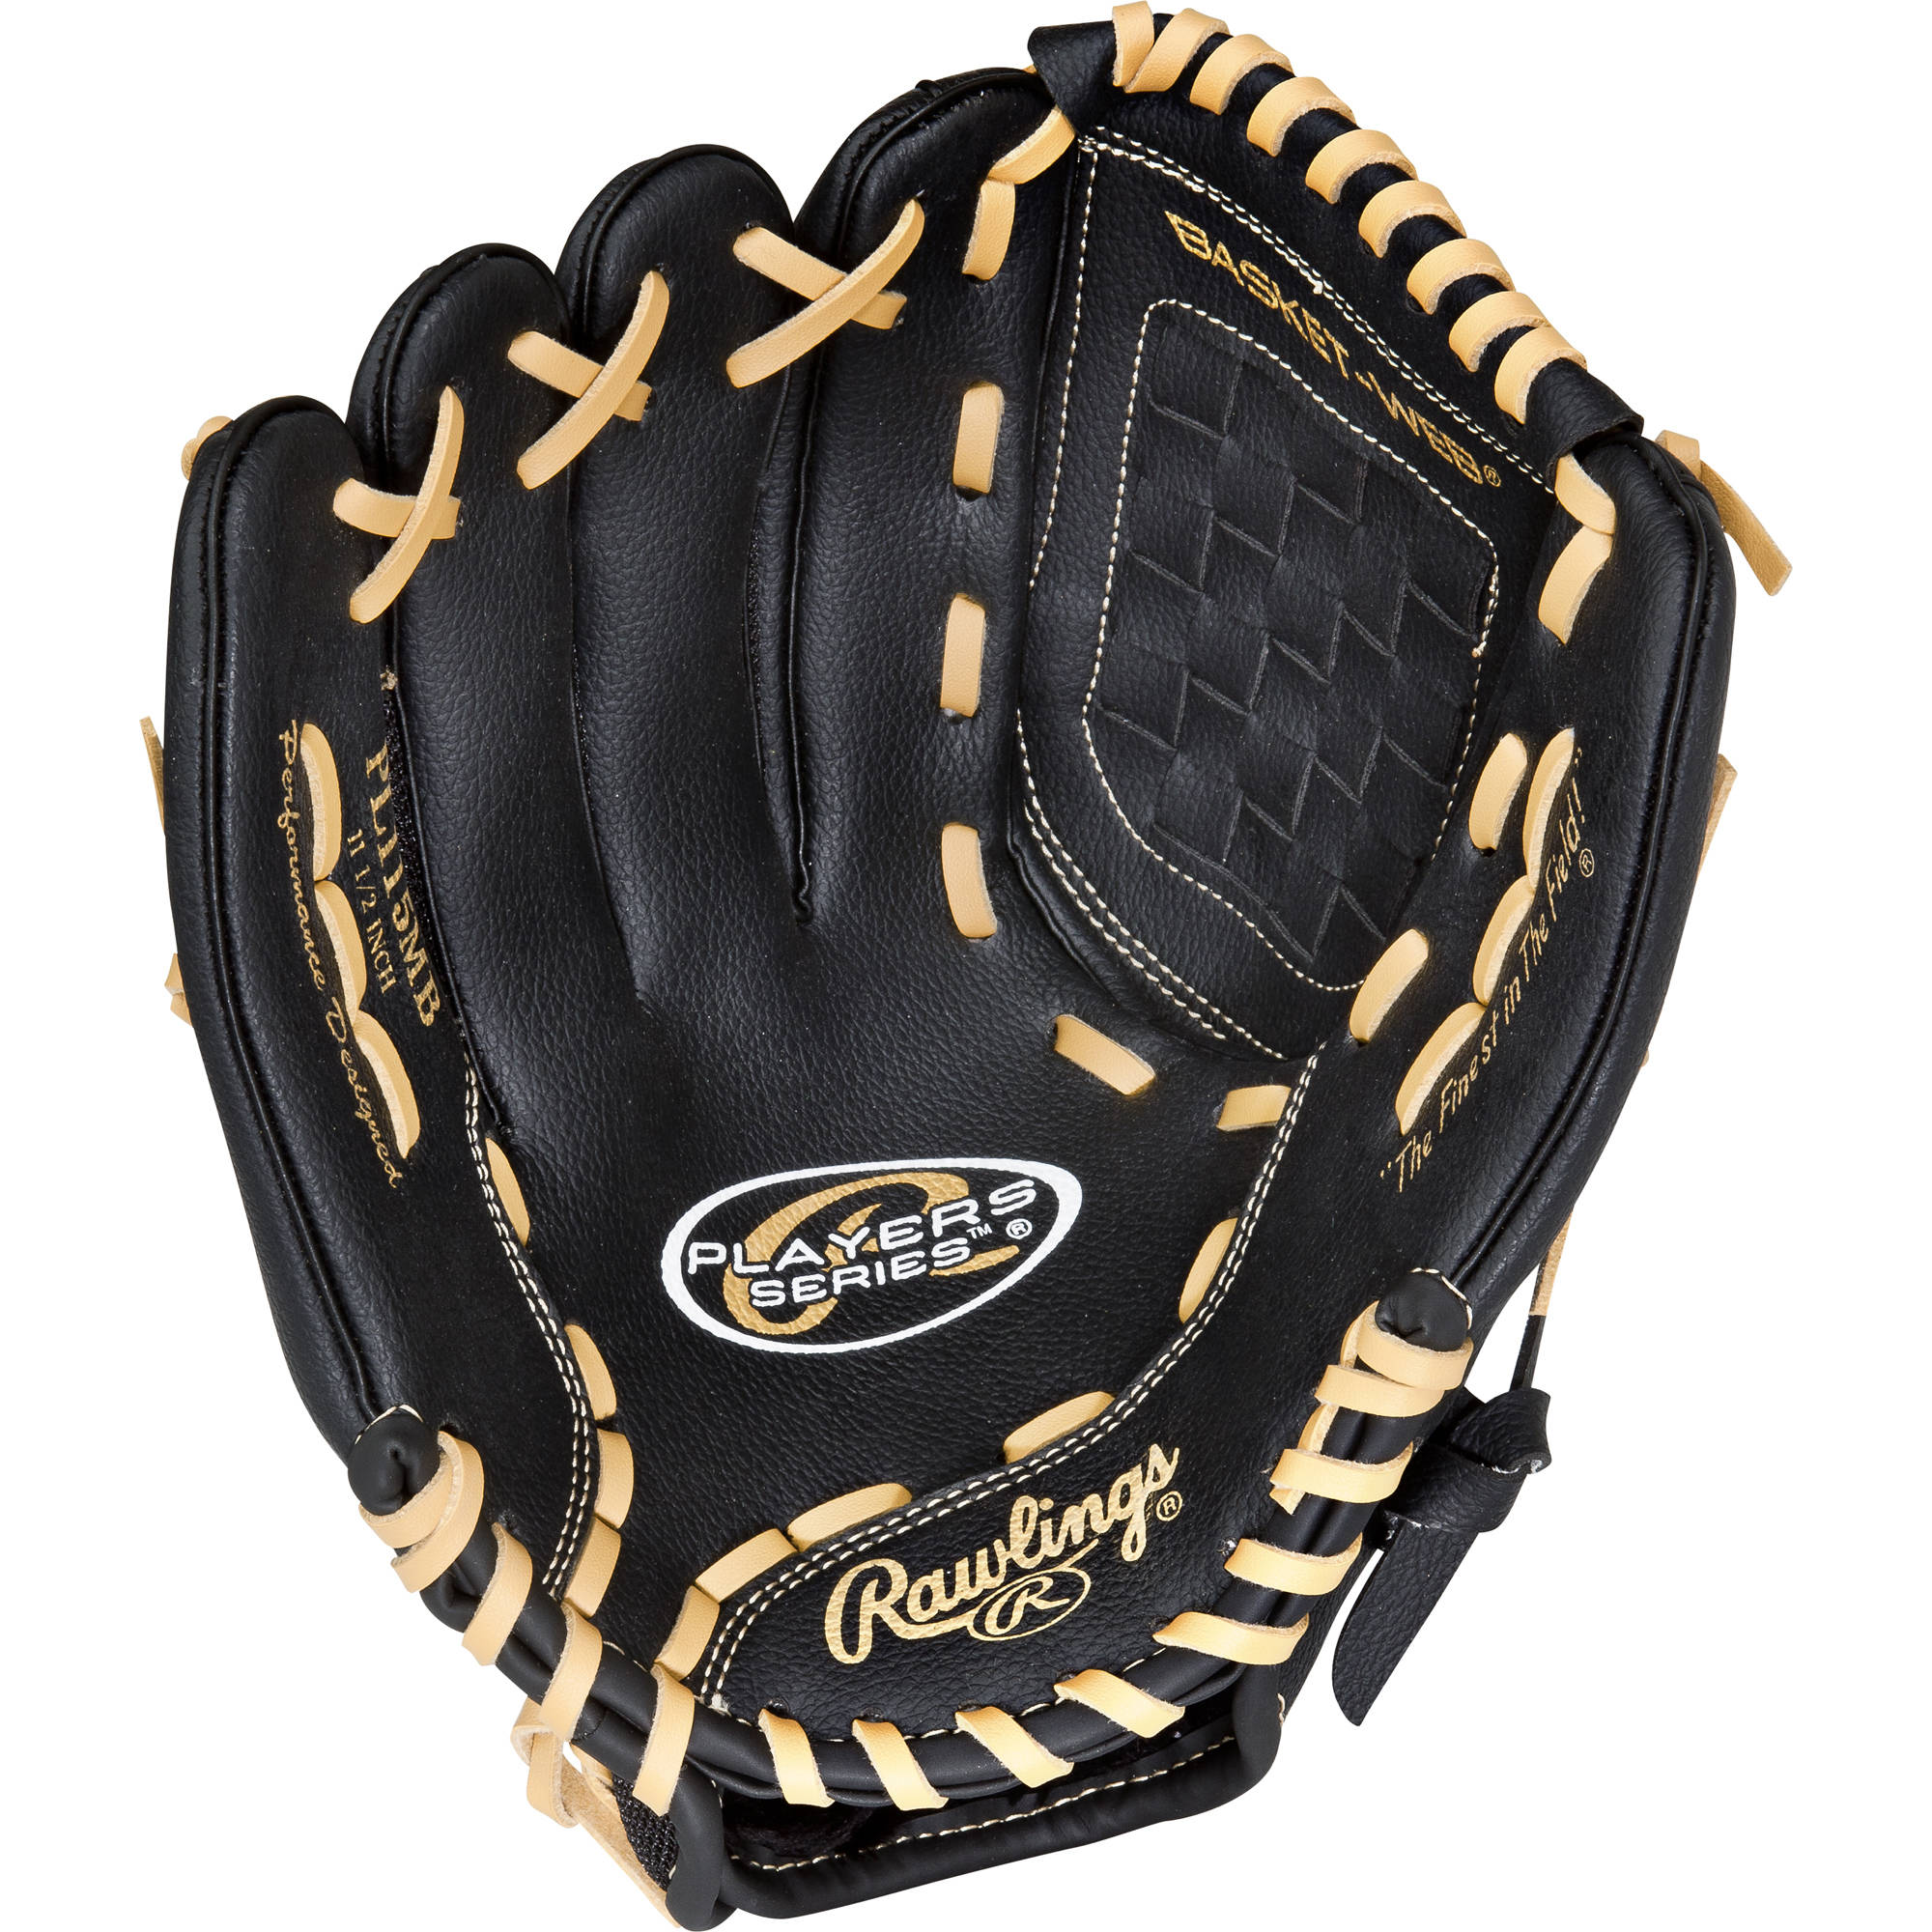 "Rawlings Baseball 11.5"" Players Series Left-Hand Throwing Baseball Fielders Glove PL115MBLH"